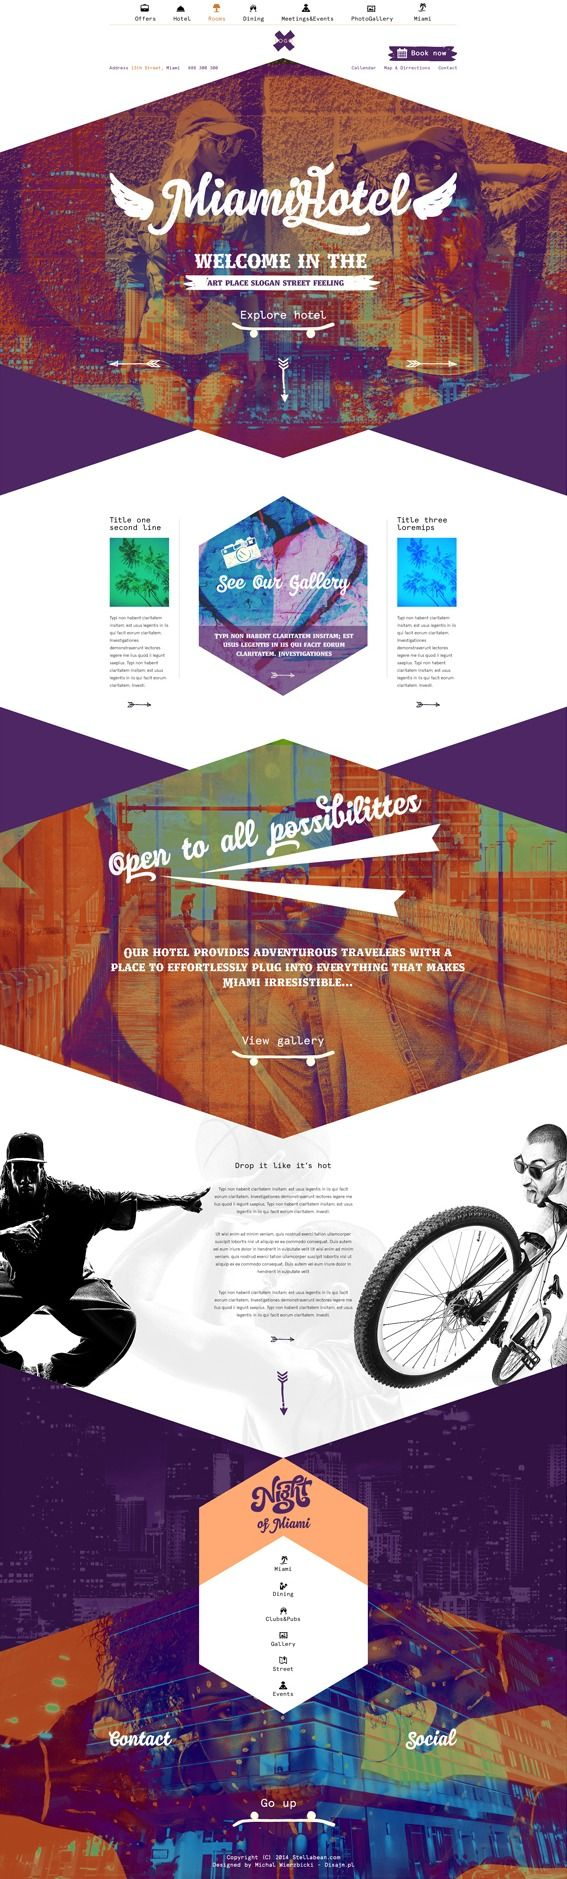 Miami Hotel. A hotel for urbaners. #webdesign #design